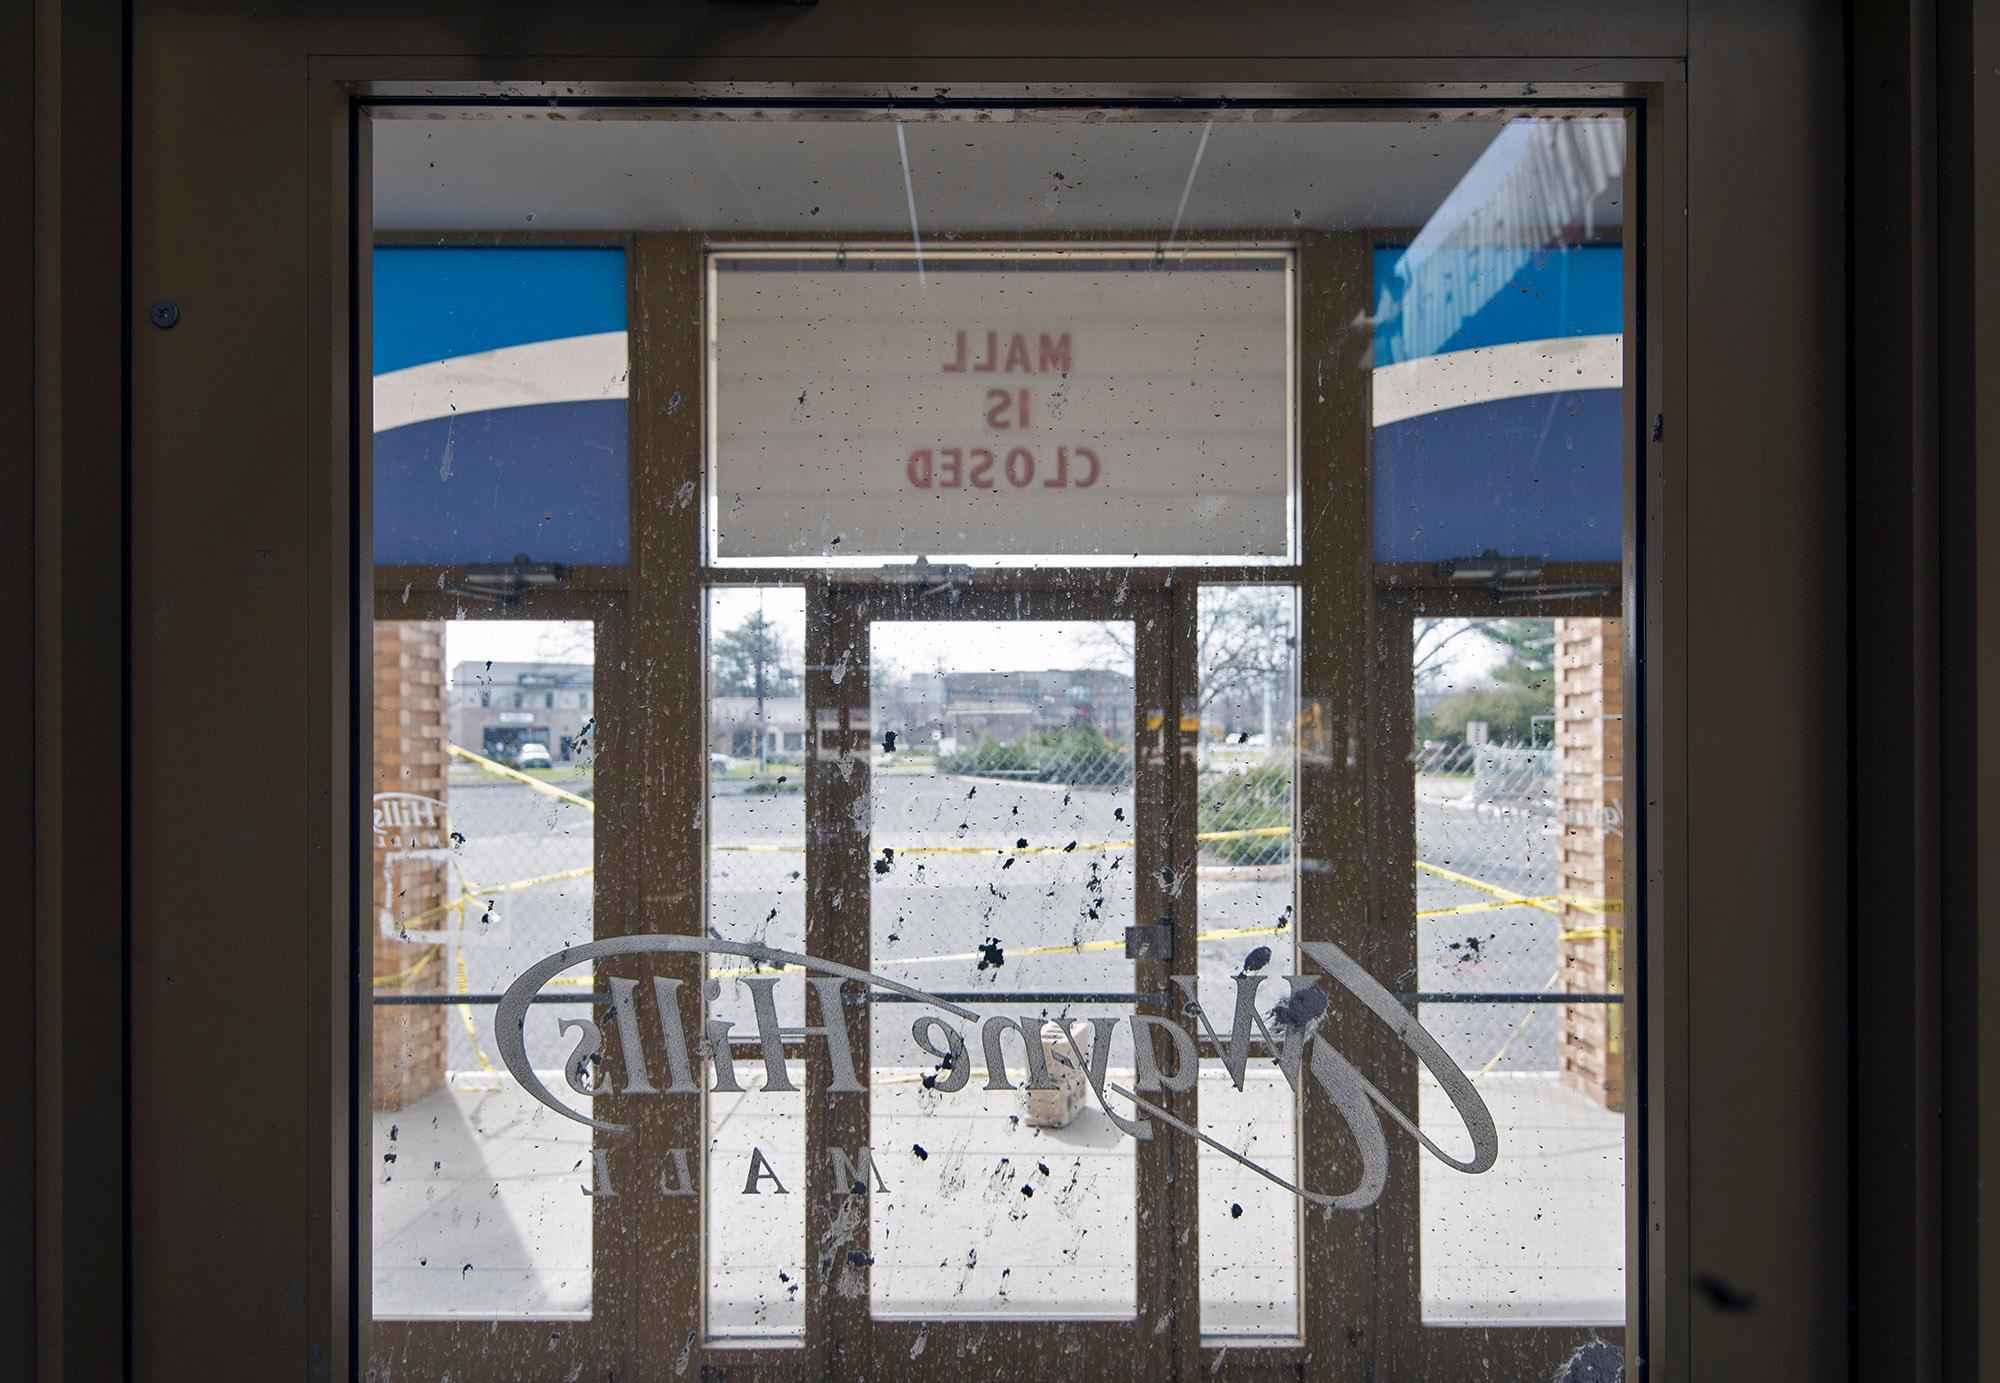 """Mall is Closed"" Wayne Hills Mall, NJ (Modern Ruins series) color photograph"